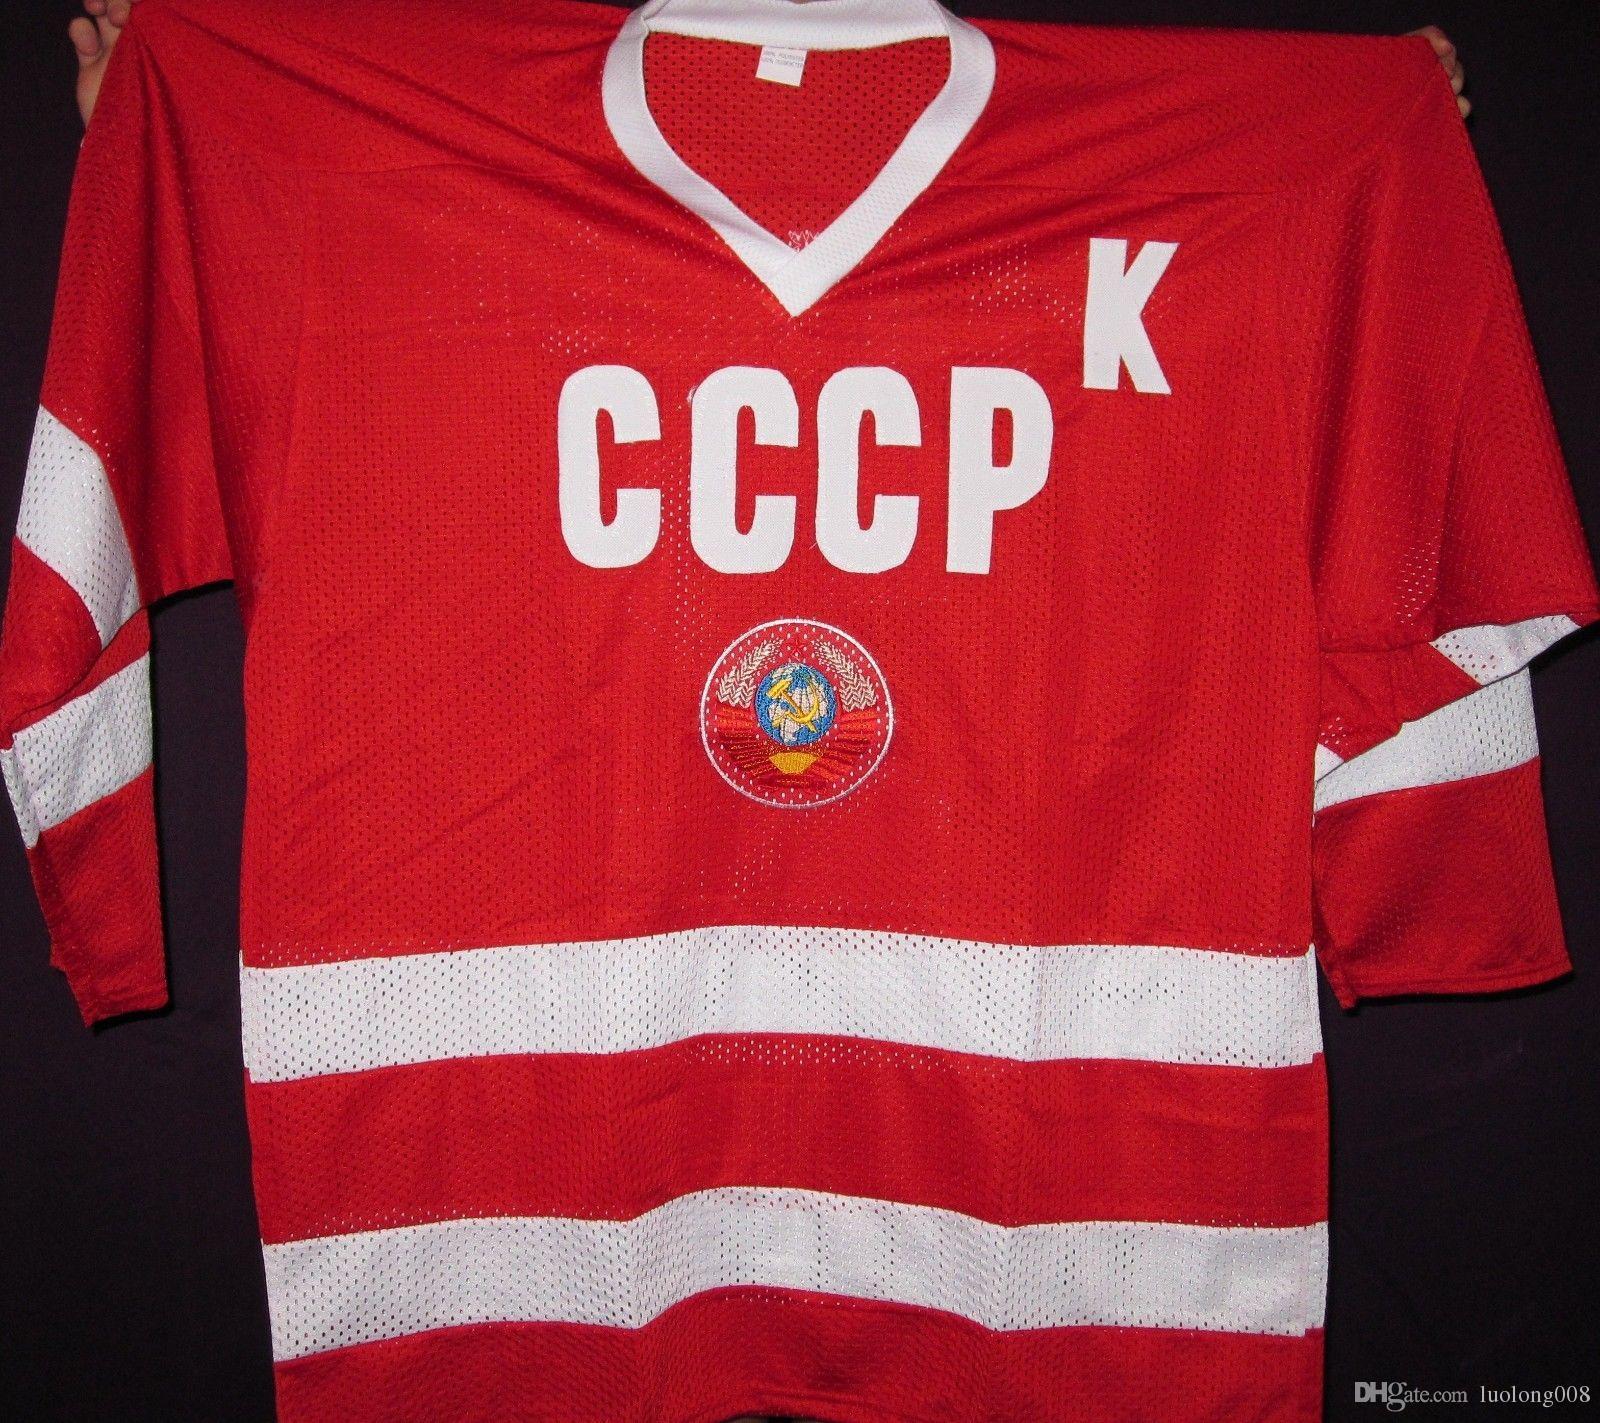 93ac6eec33b 2019 USSR CCCP Russian#2 Viacheslav Fetisov 17 Alexander Kharlamov 20  Vladislav Tretiak Hockey Jersey Embroidery Customize Any Name From  Luolong008, ...